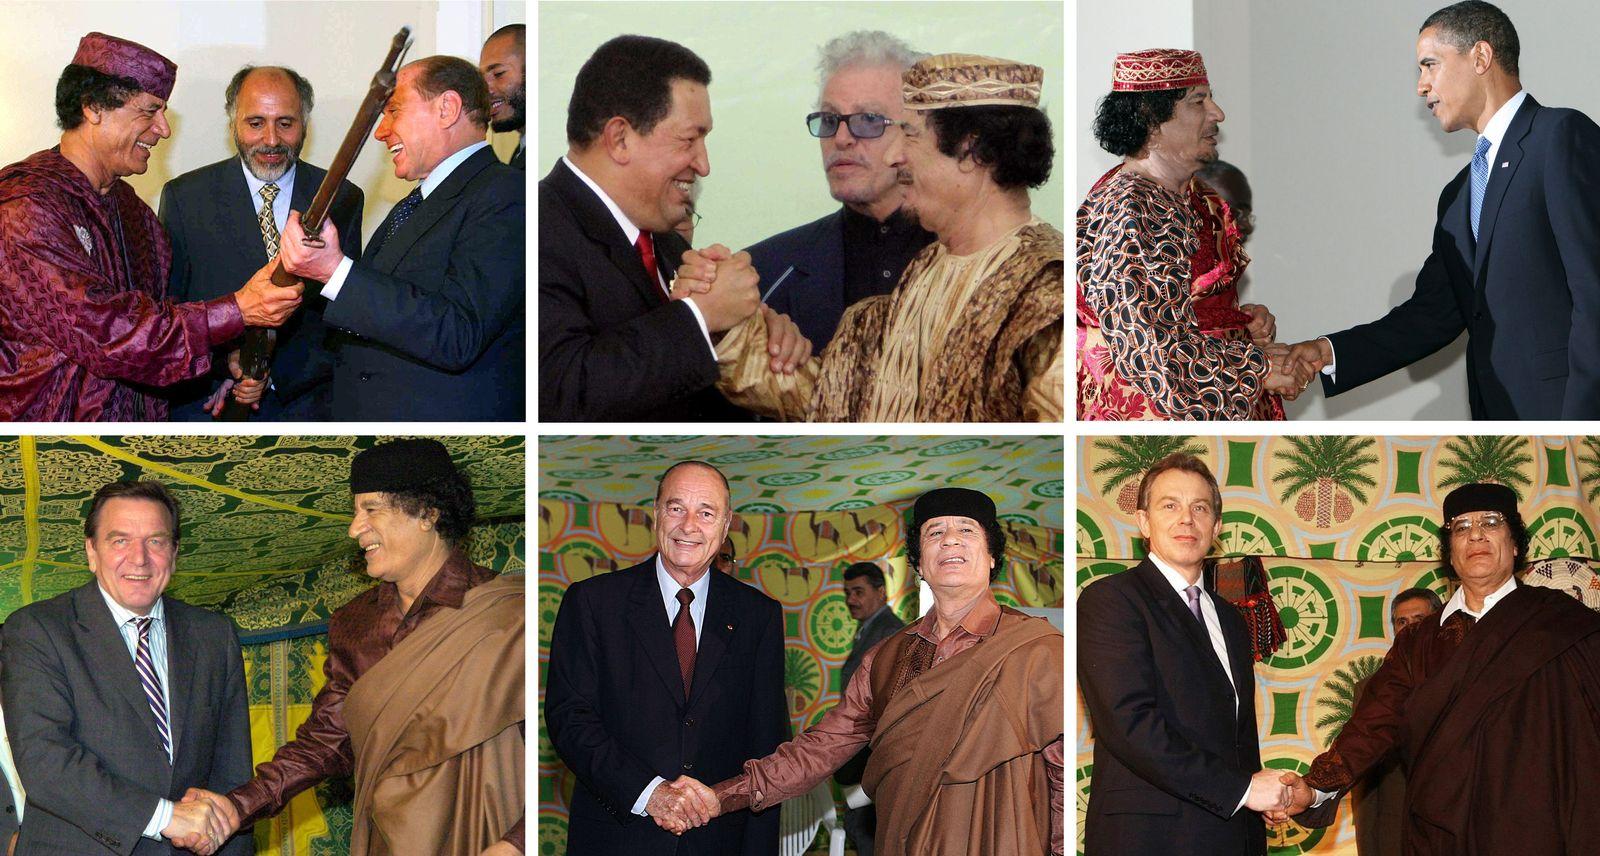 Tony Blair / Muammar al-Gaddafi